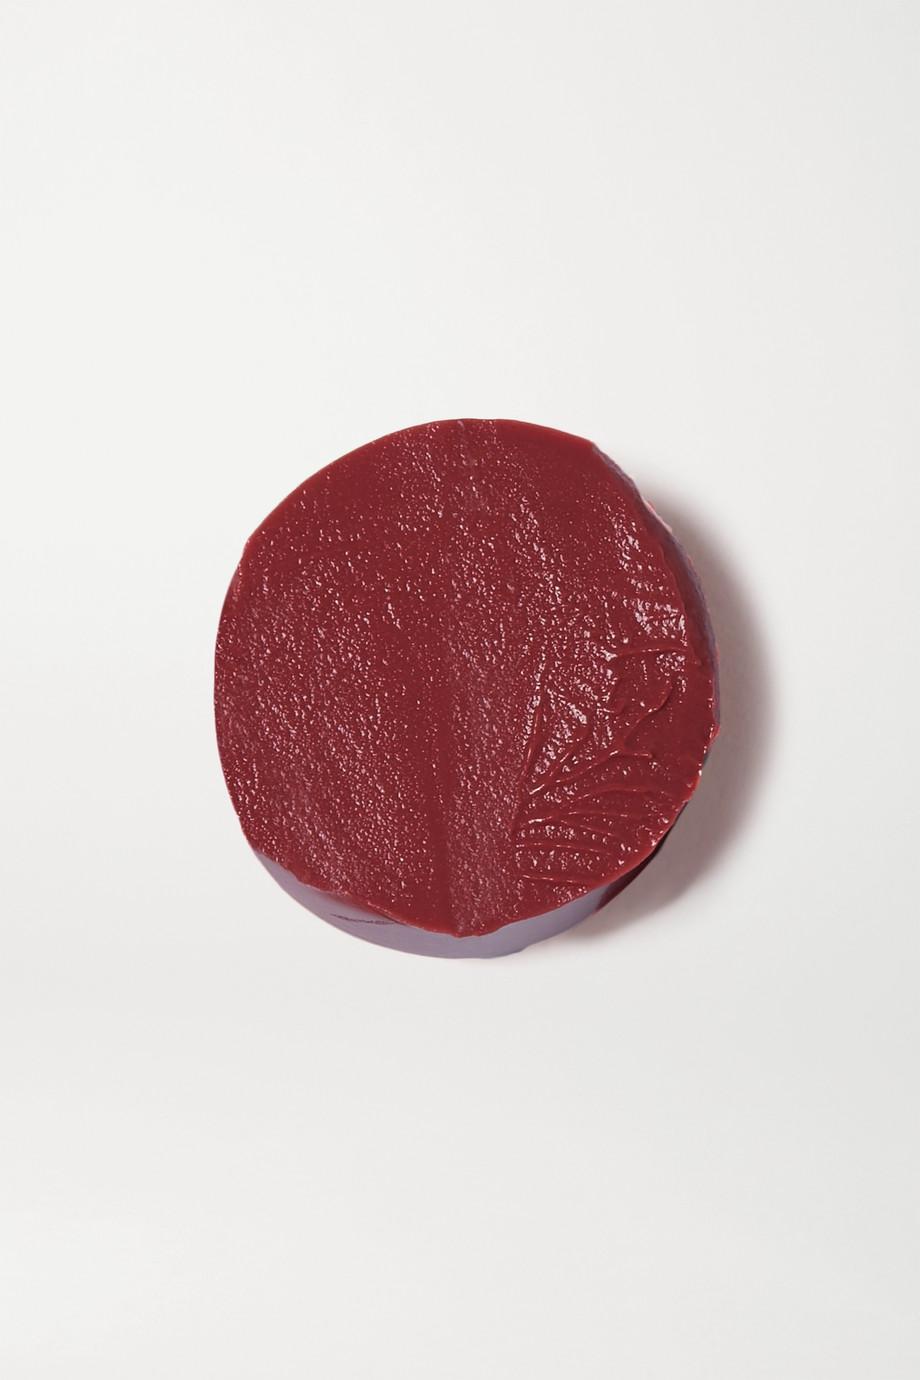 Charlotte Tilbury Hyaluronic Happikiss Lipstick Balm - Happiberry